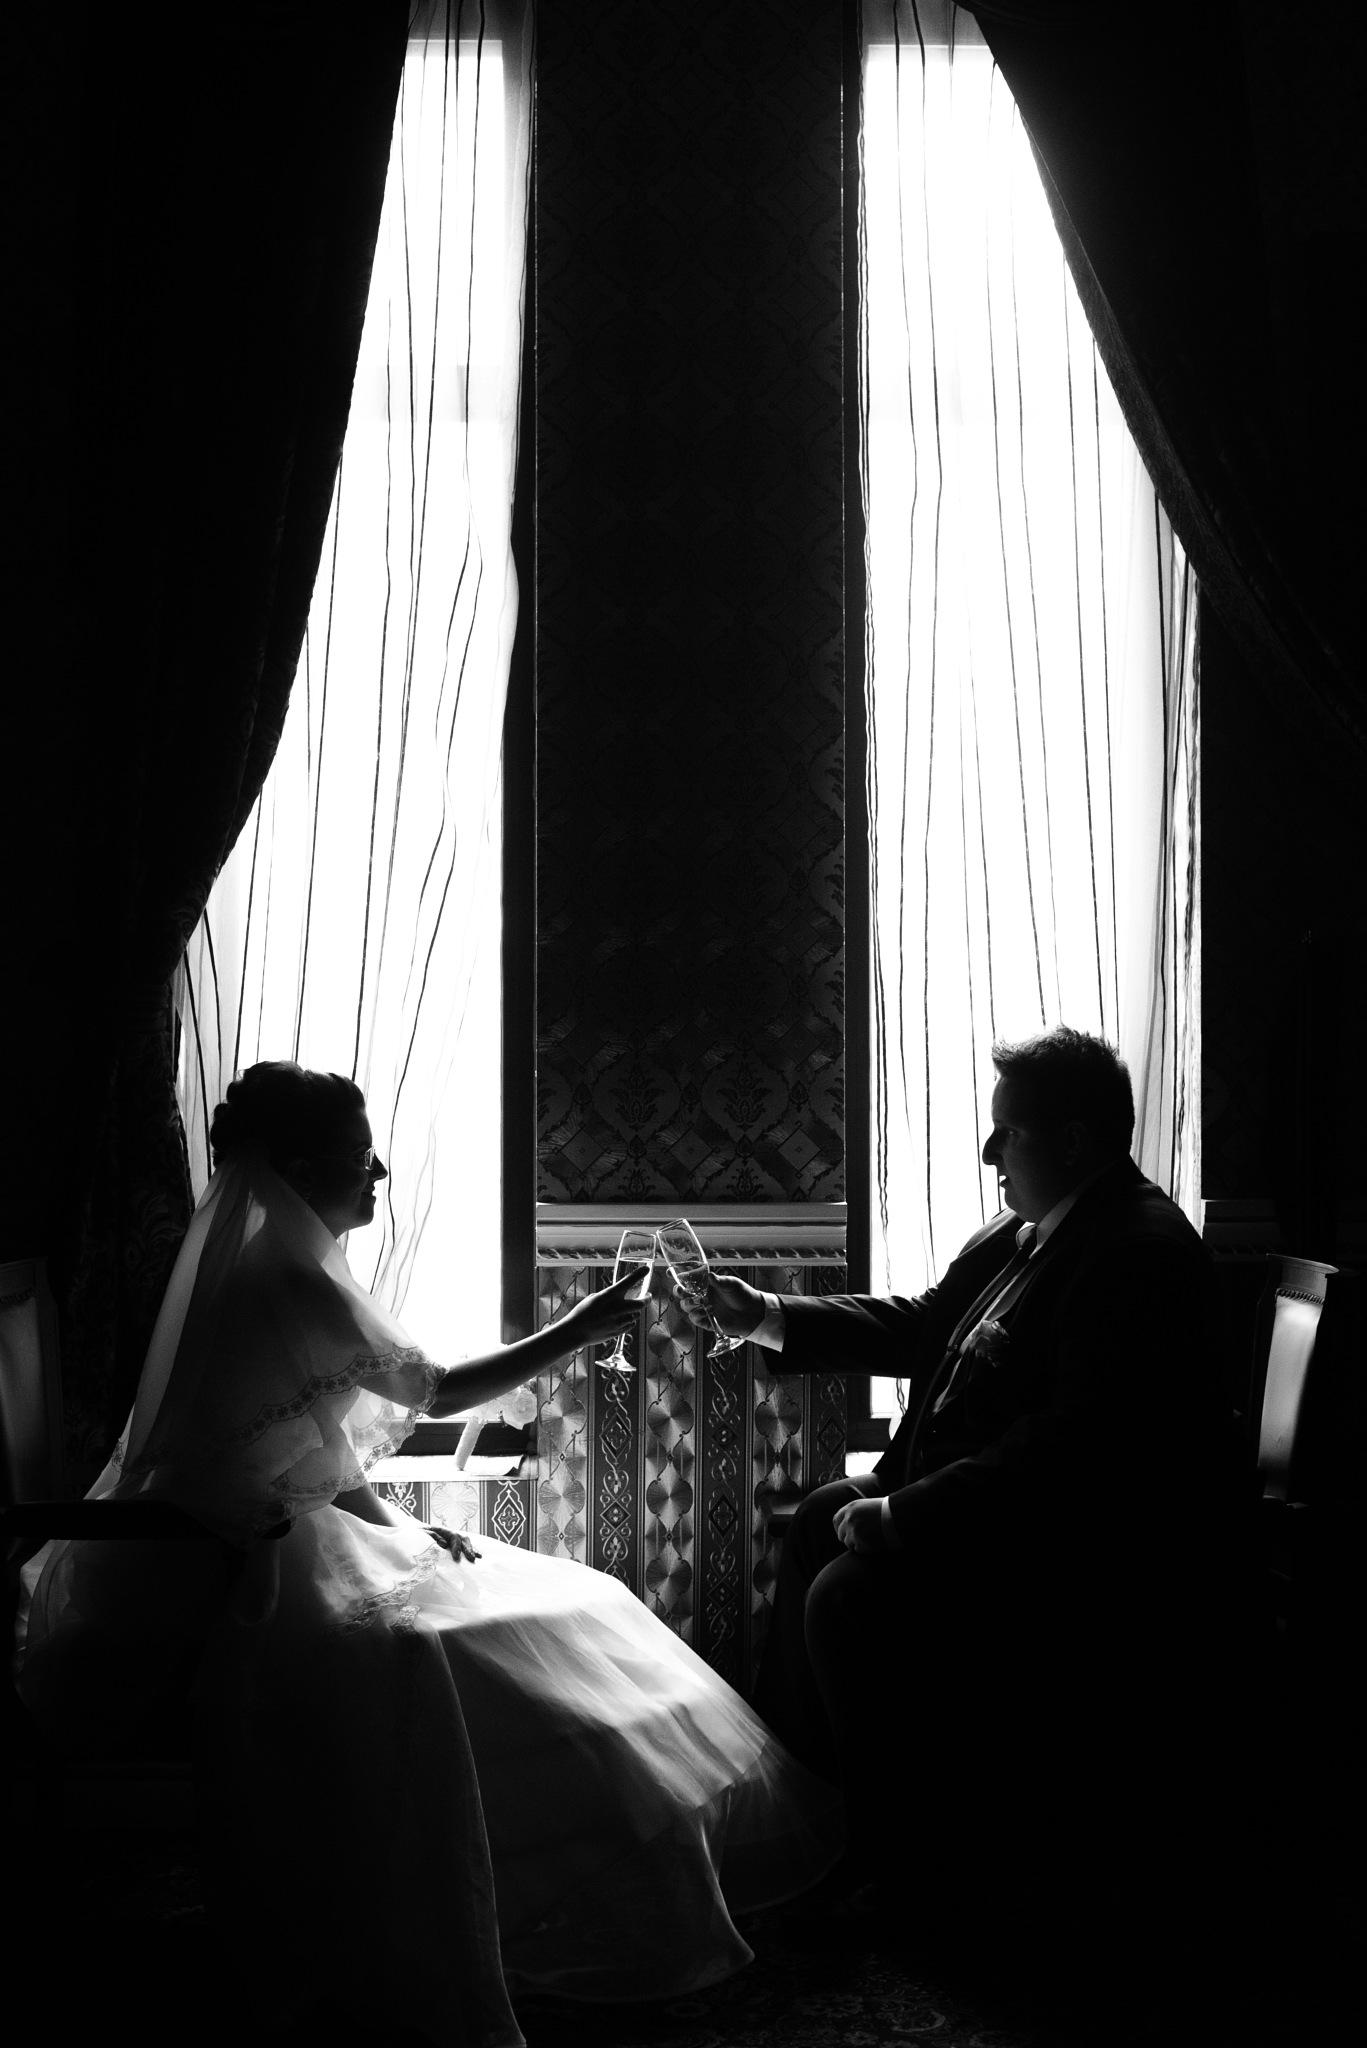 The wedding couple silhouette by Vili Pefticheva